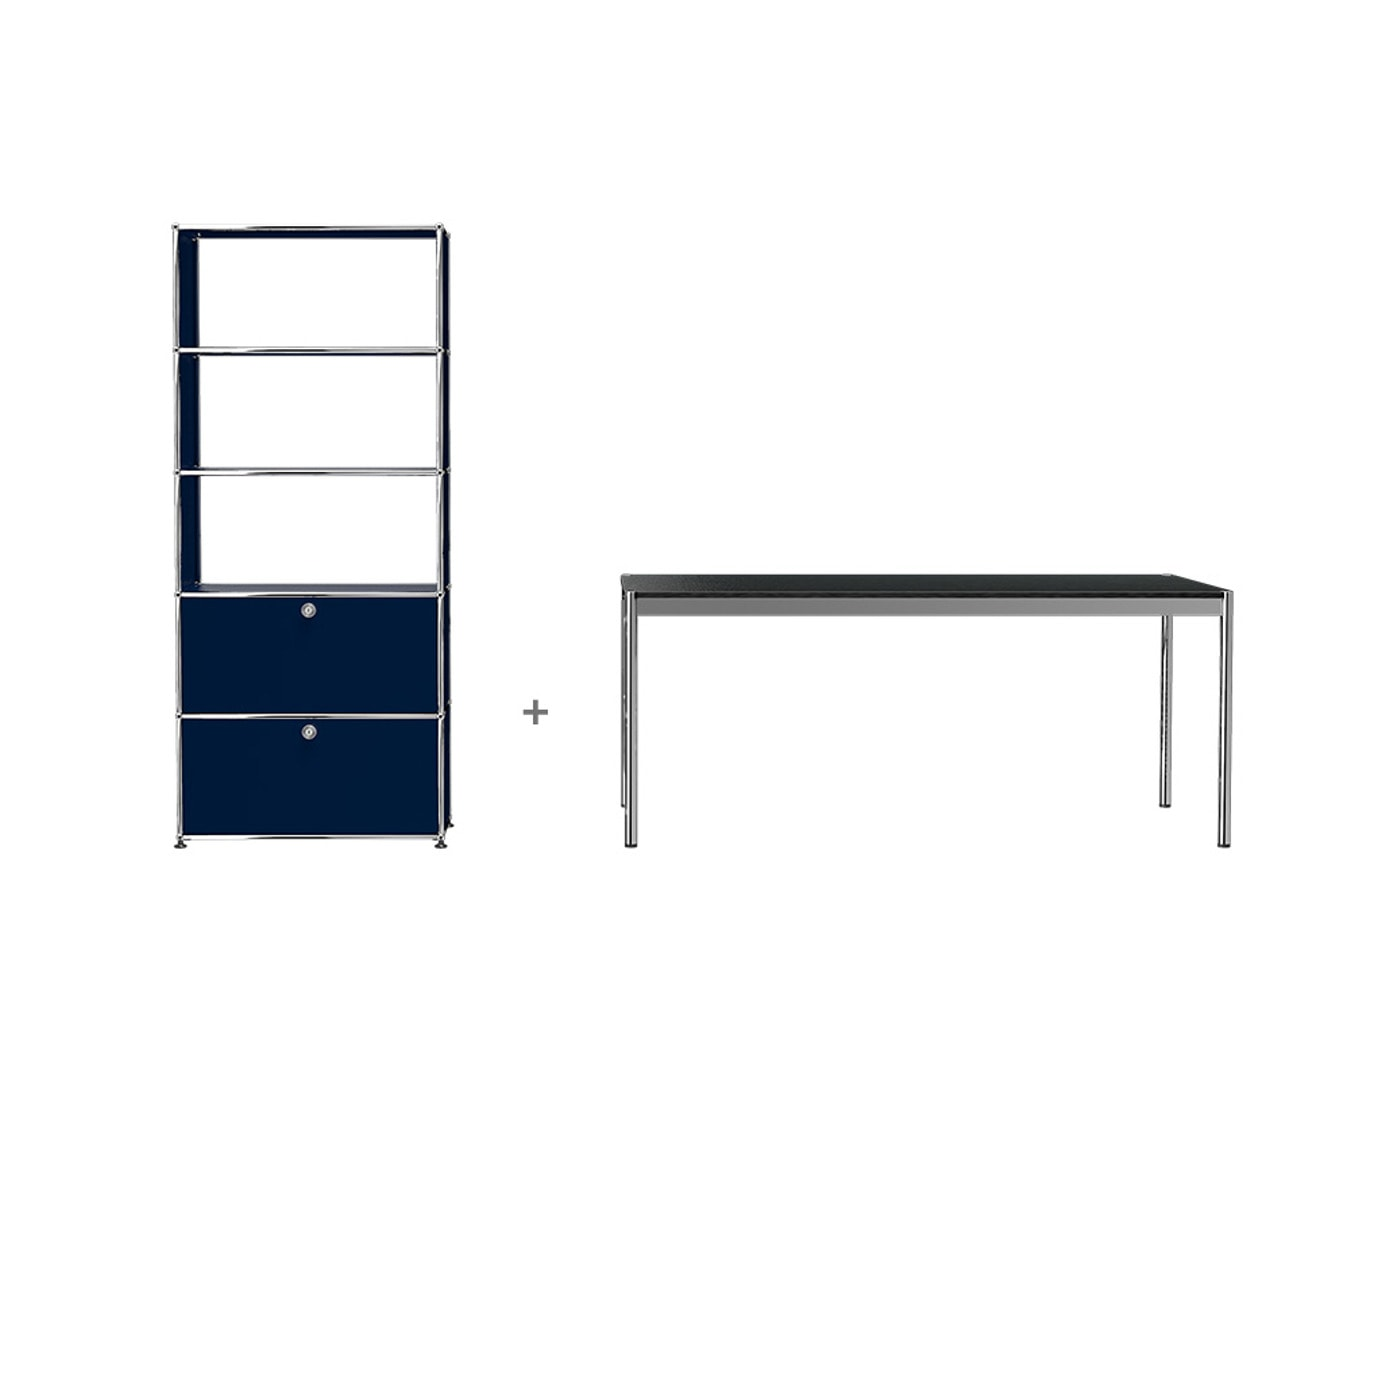 USM HomeOffice 04 Haller tavolo contenitore libreria con ante